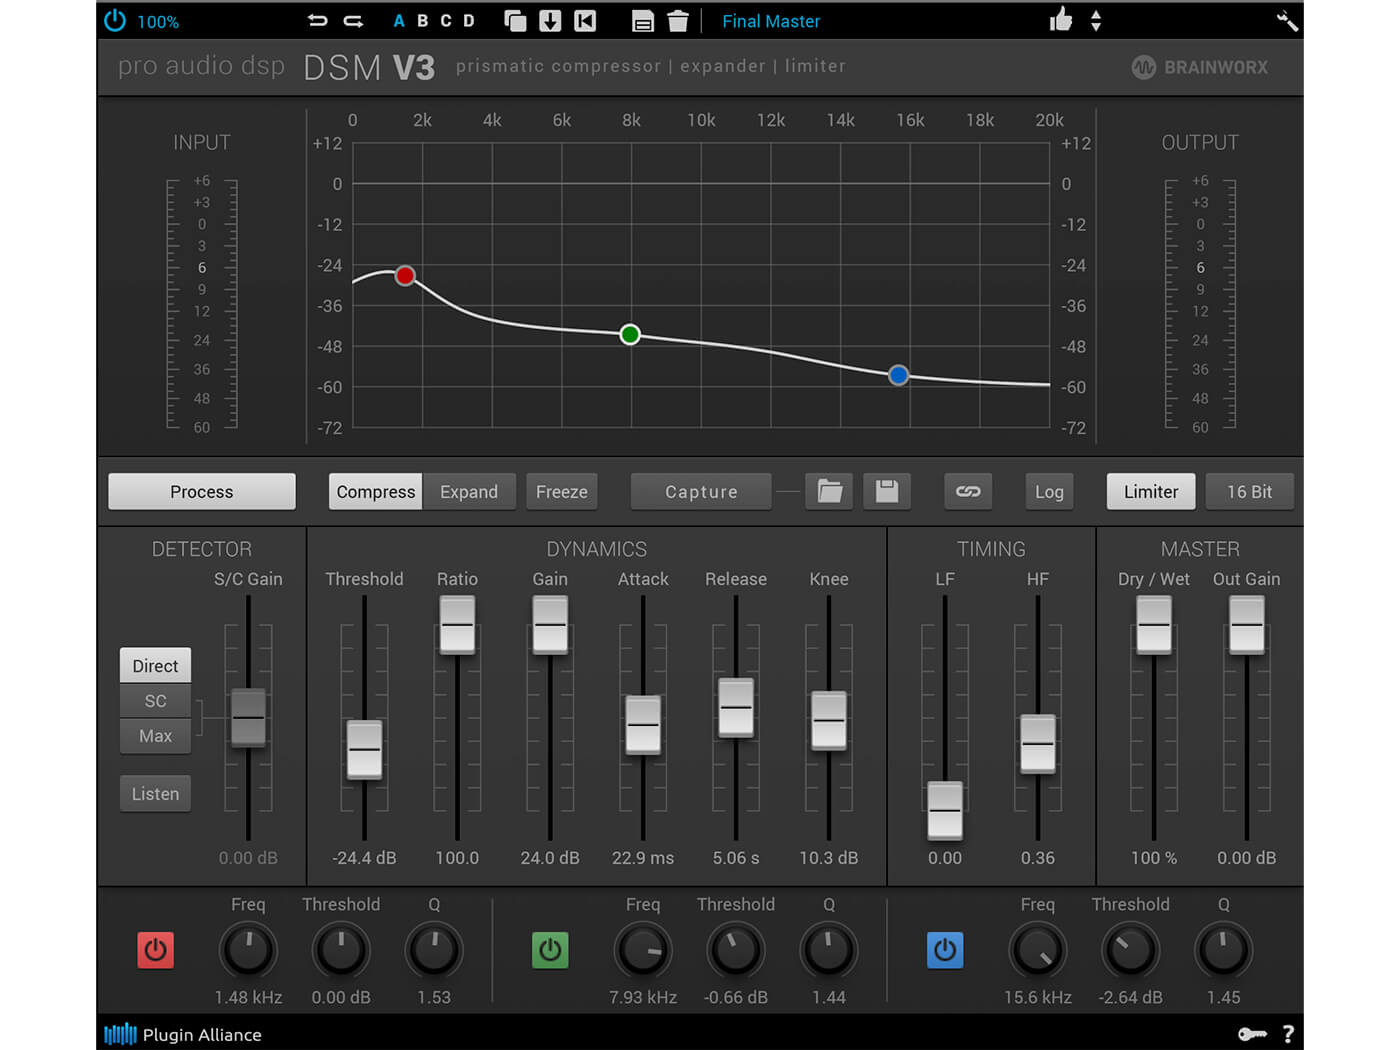 Pro Audio DSP DSM V3